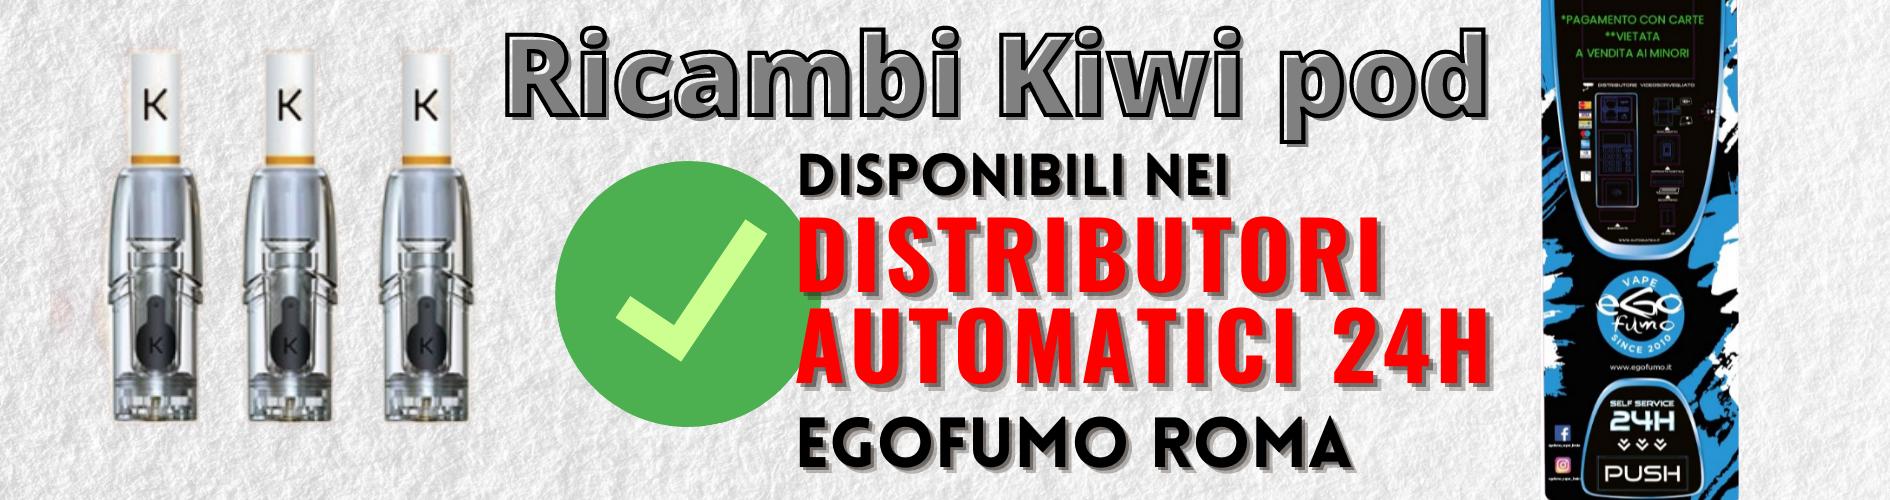 Ricambi Kiwi Roma disponibili nei distributori automatici 24h eGofumo